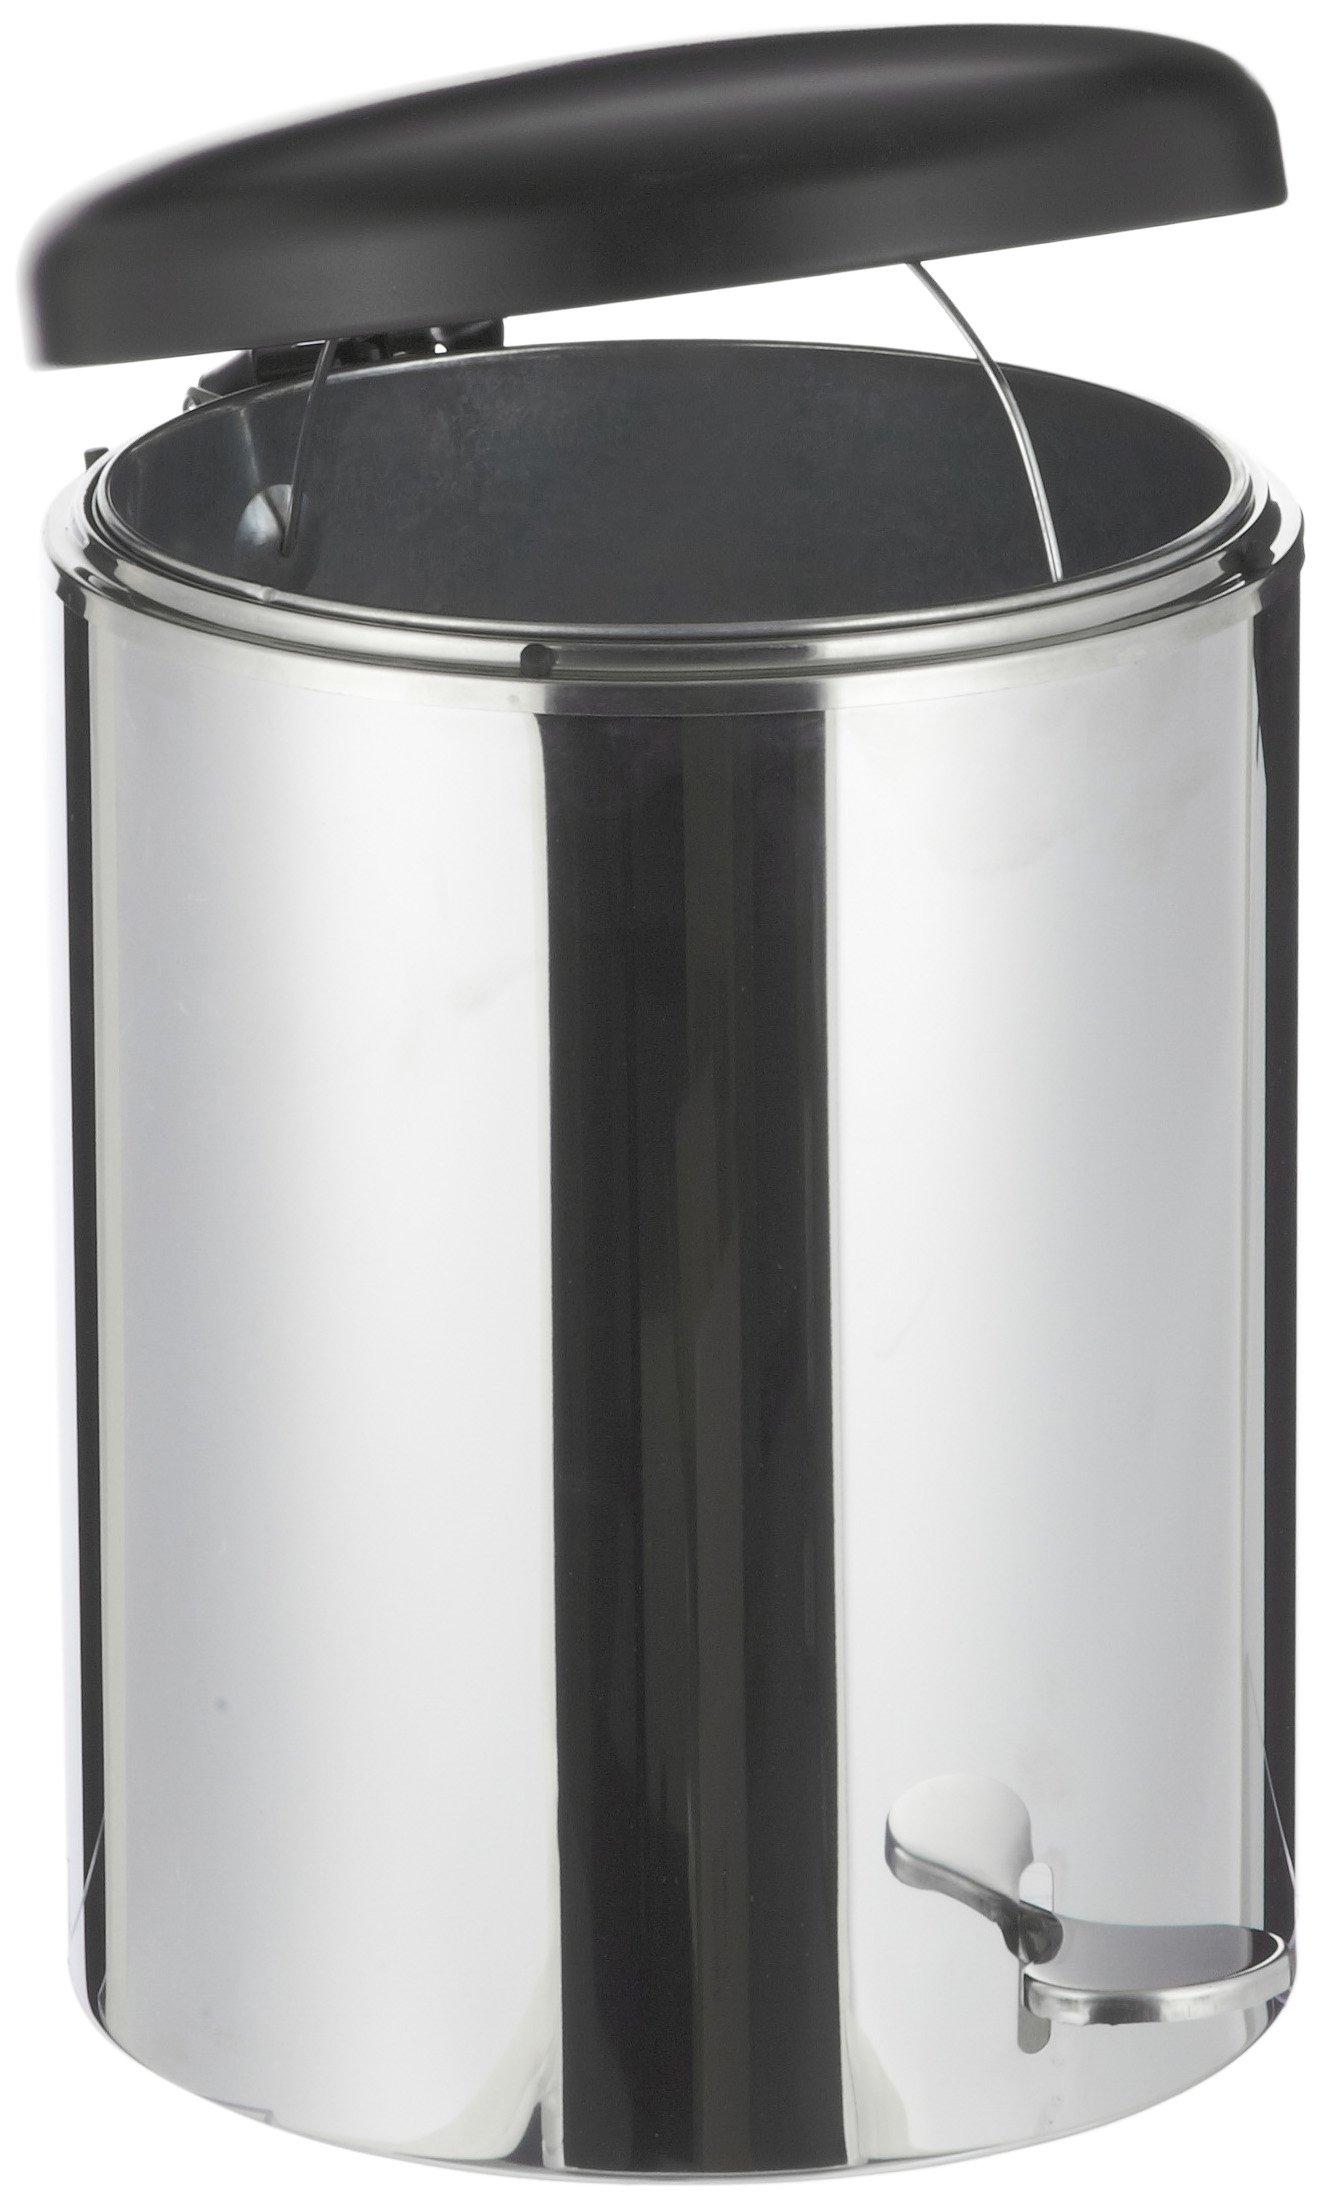 WITT 2240SS Stainless Steel Step On Metal Biohazard Waste Container, 4gal Capacity, 11-1/2'' Diameter x 16'' Height,